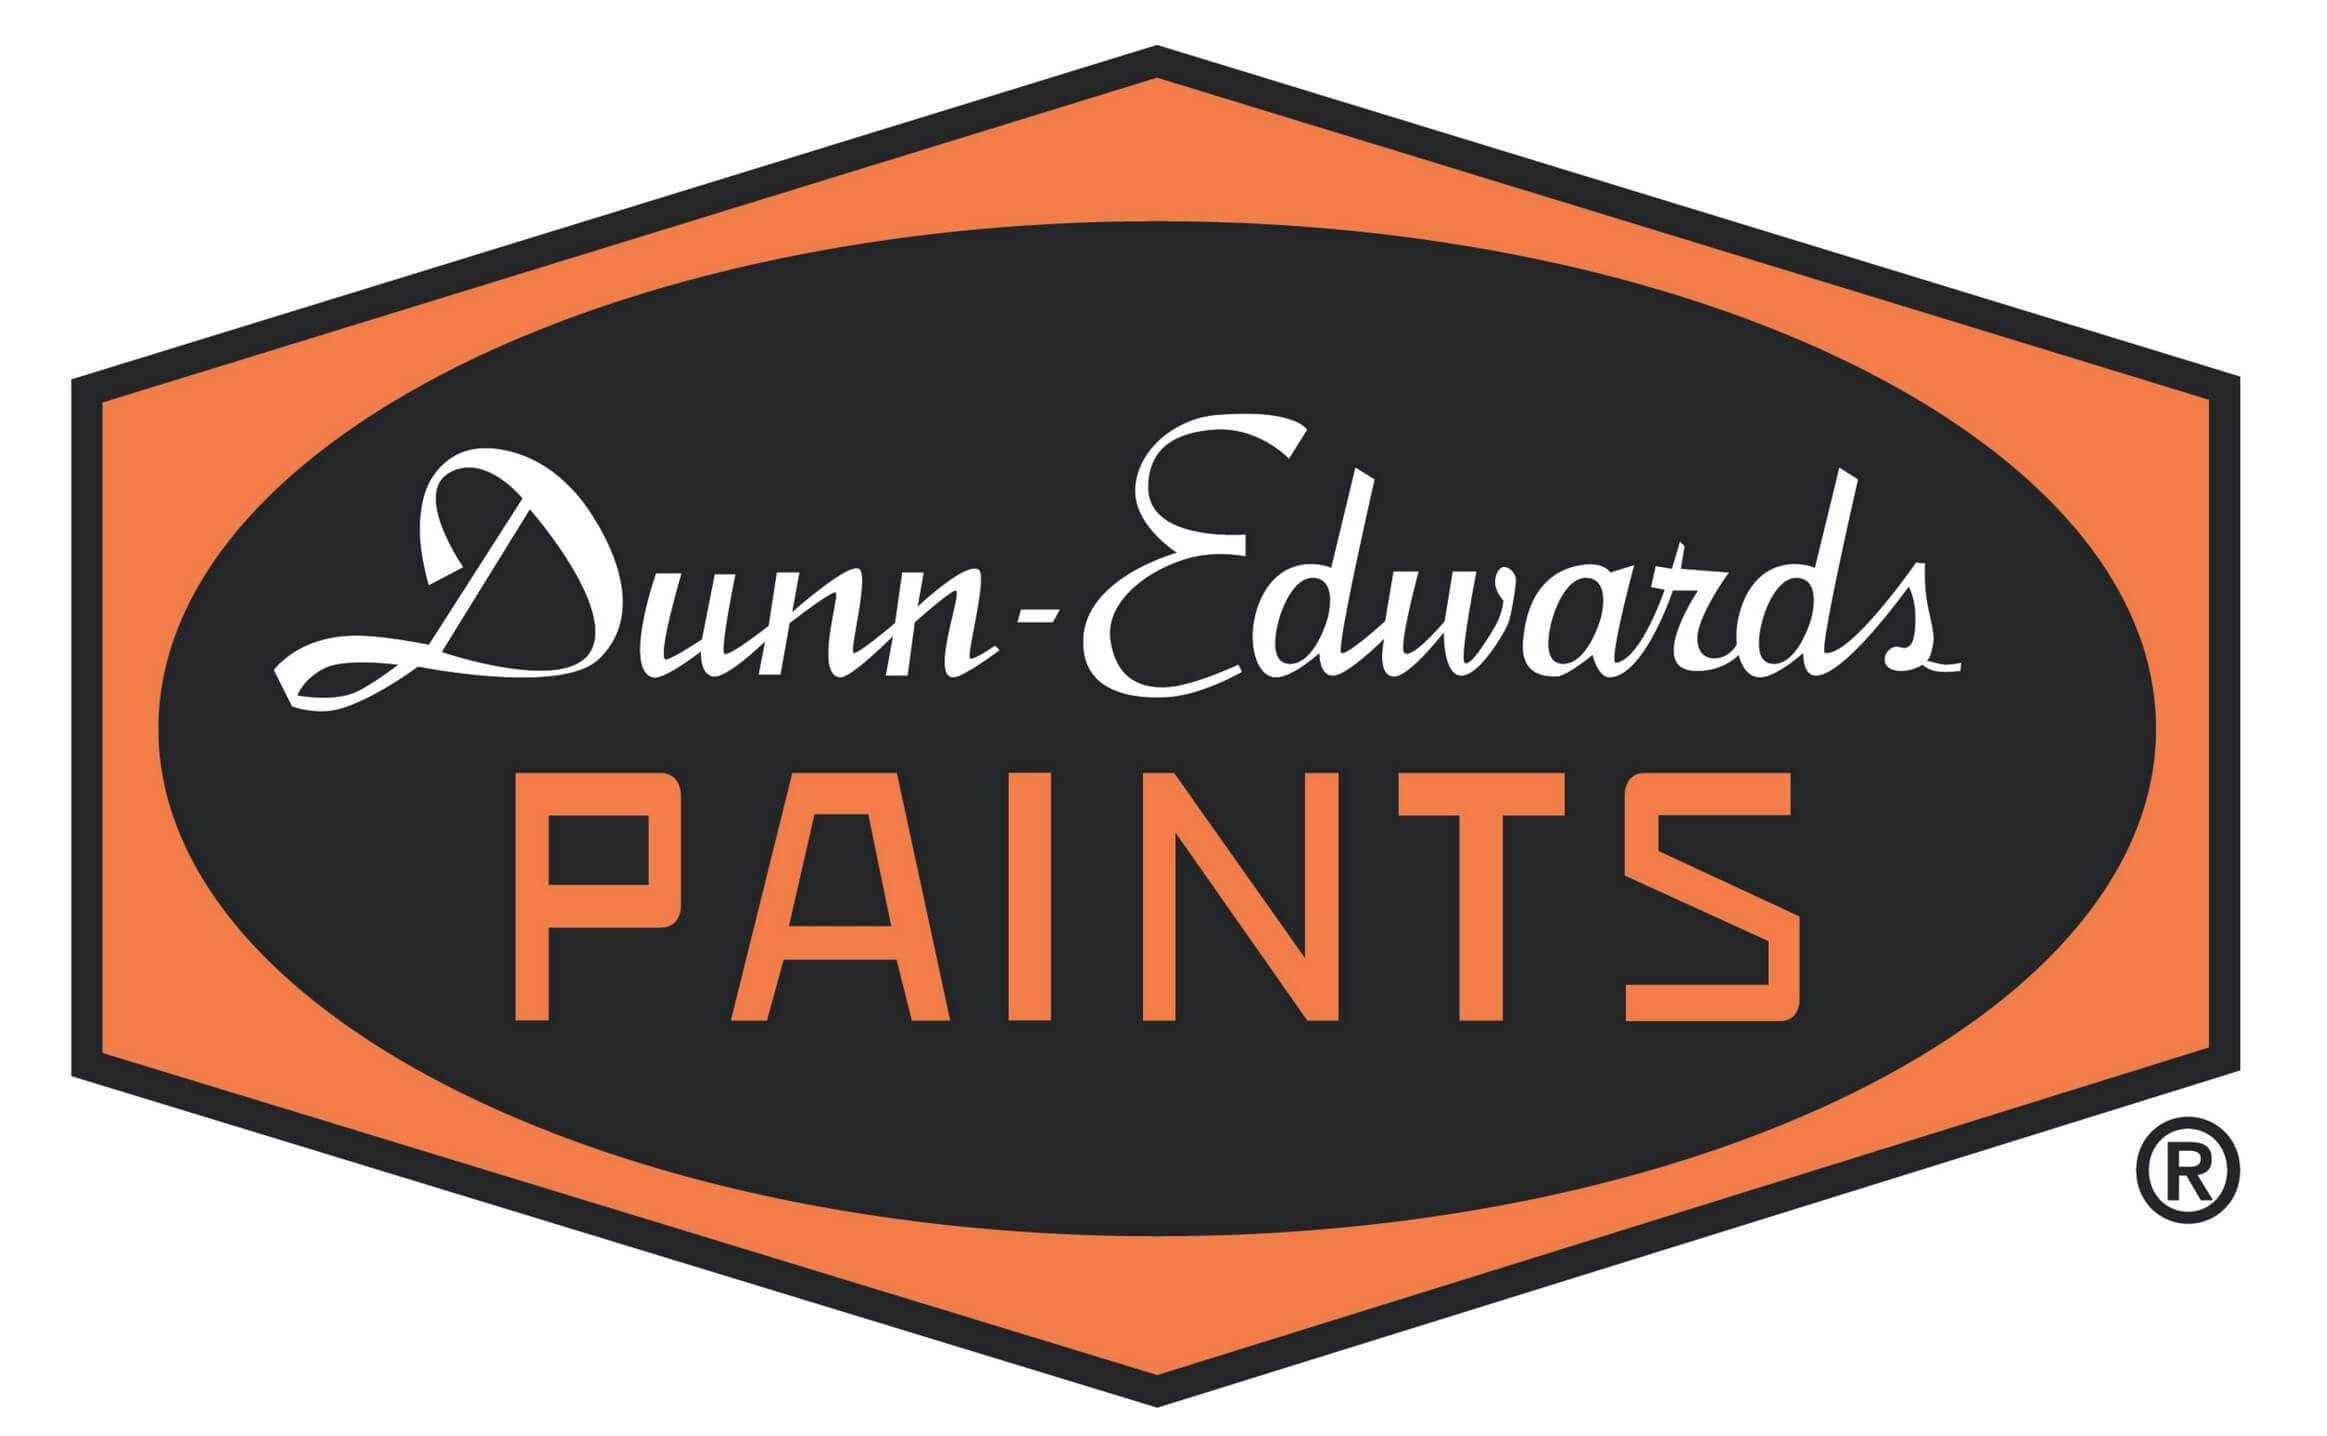 Dunn Edwards Paints Logo png